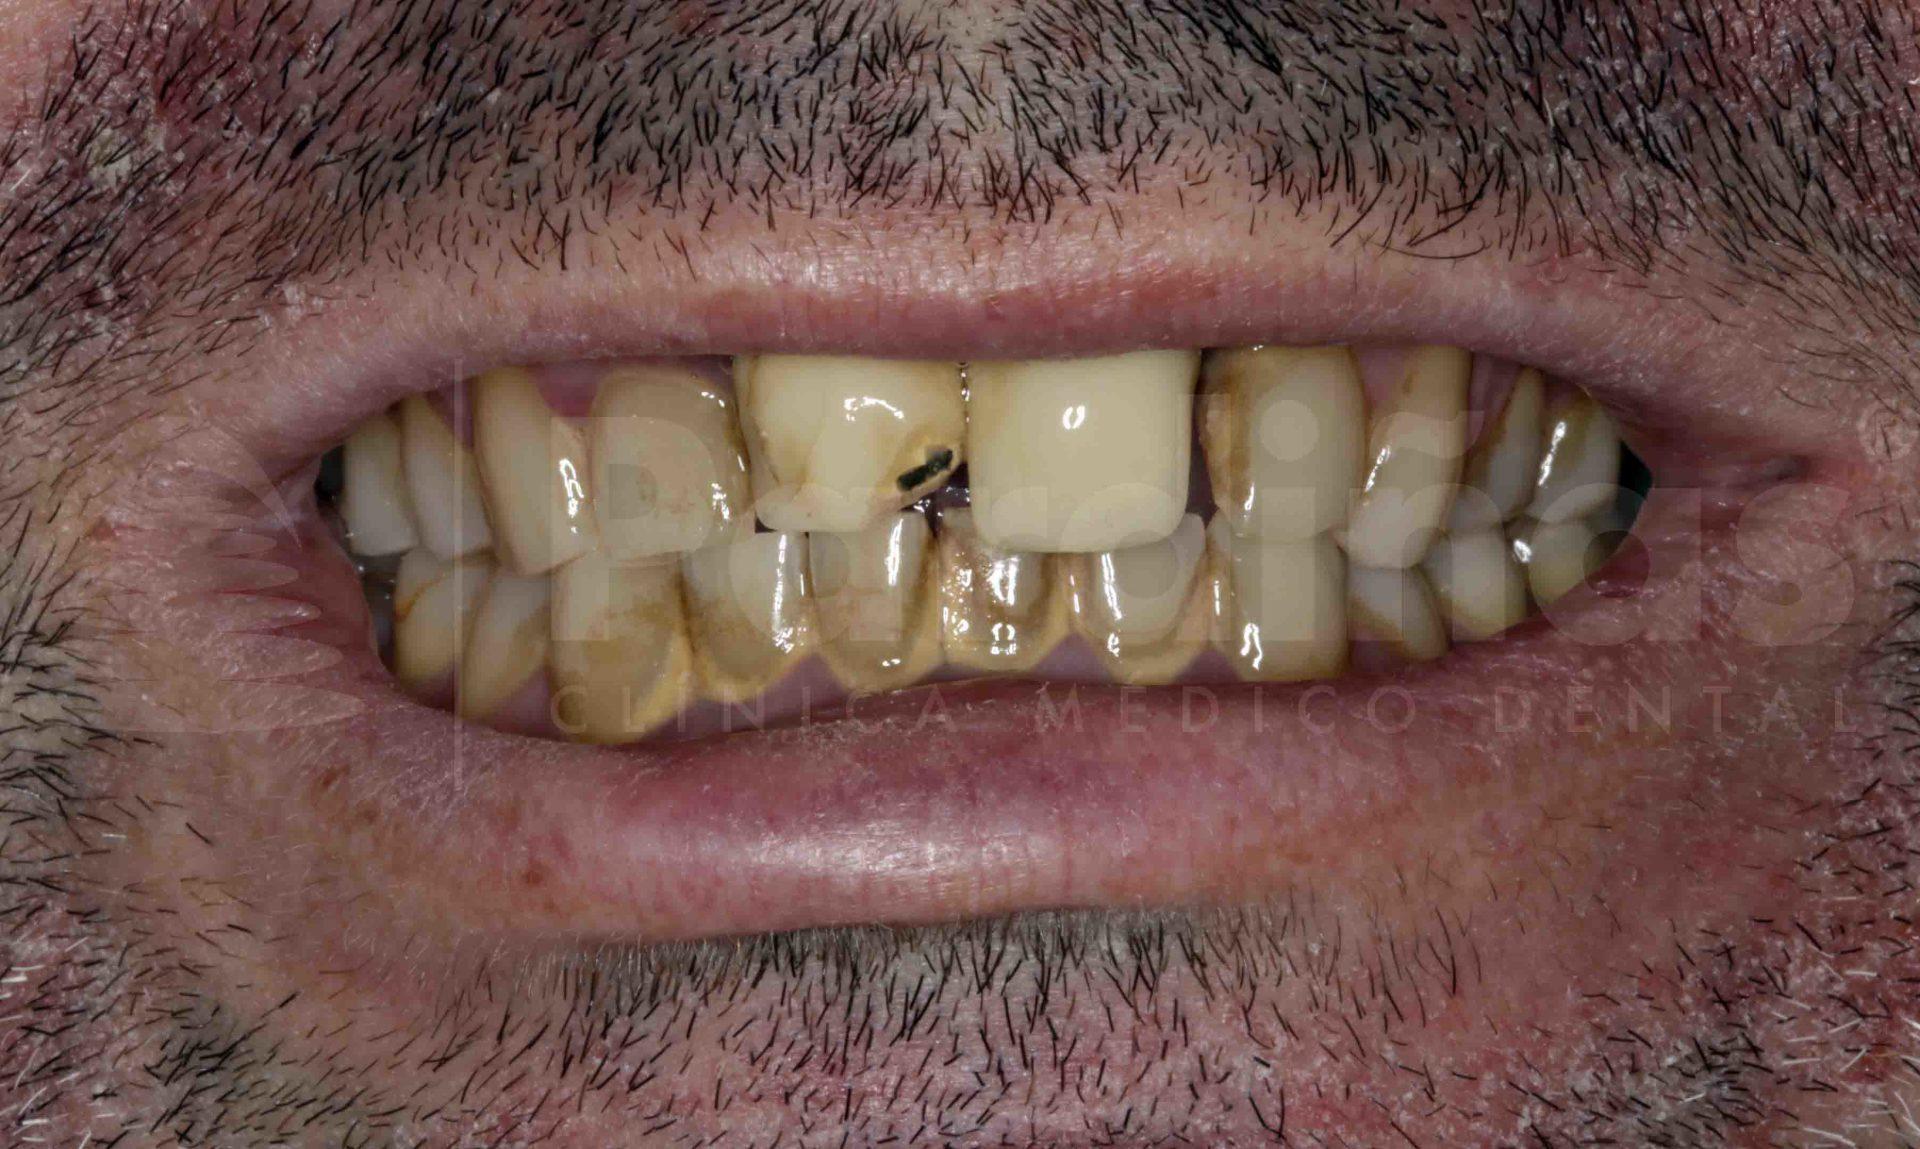 rehabilitacion-protesis-diente-natural-antes